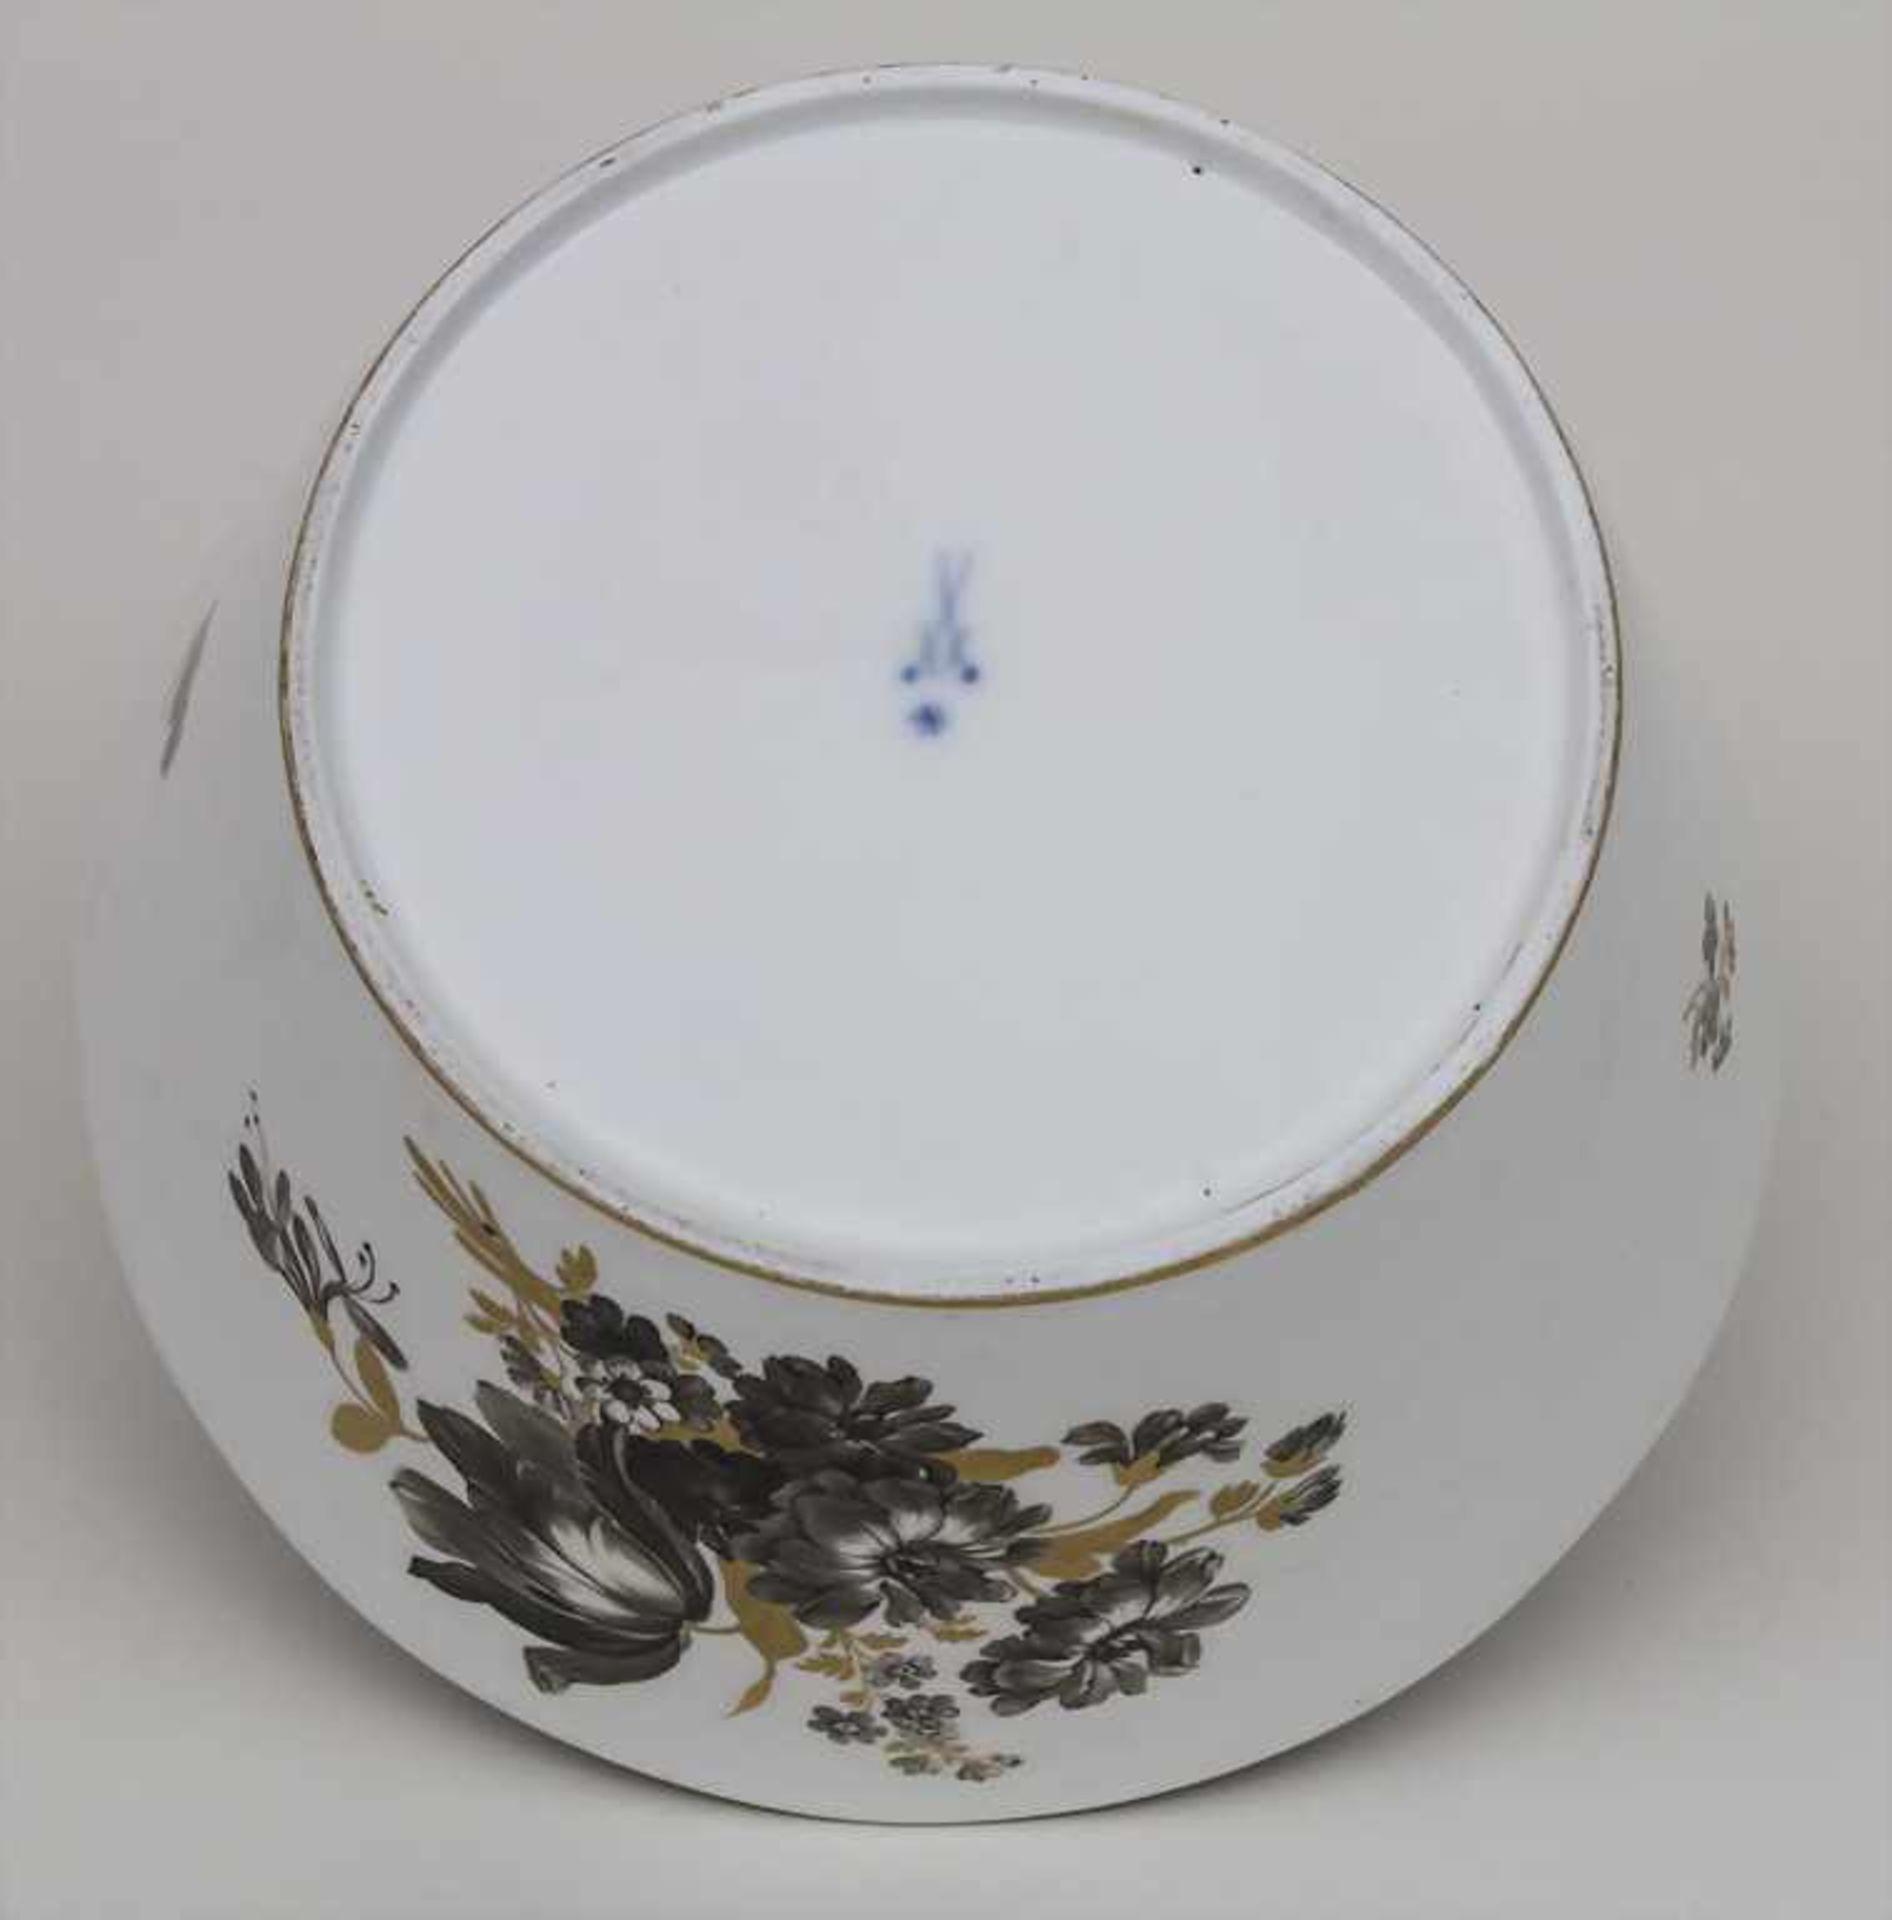 Schale mit Blumenbouquets / A bowl with bouquets of flowers, Meissen, um 1774-1814 Material: - Bild 4 aus 4